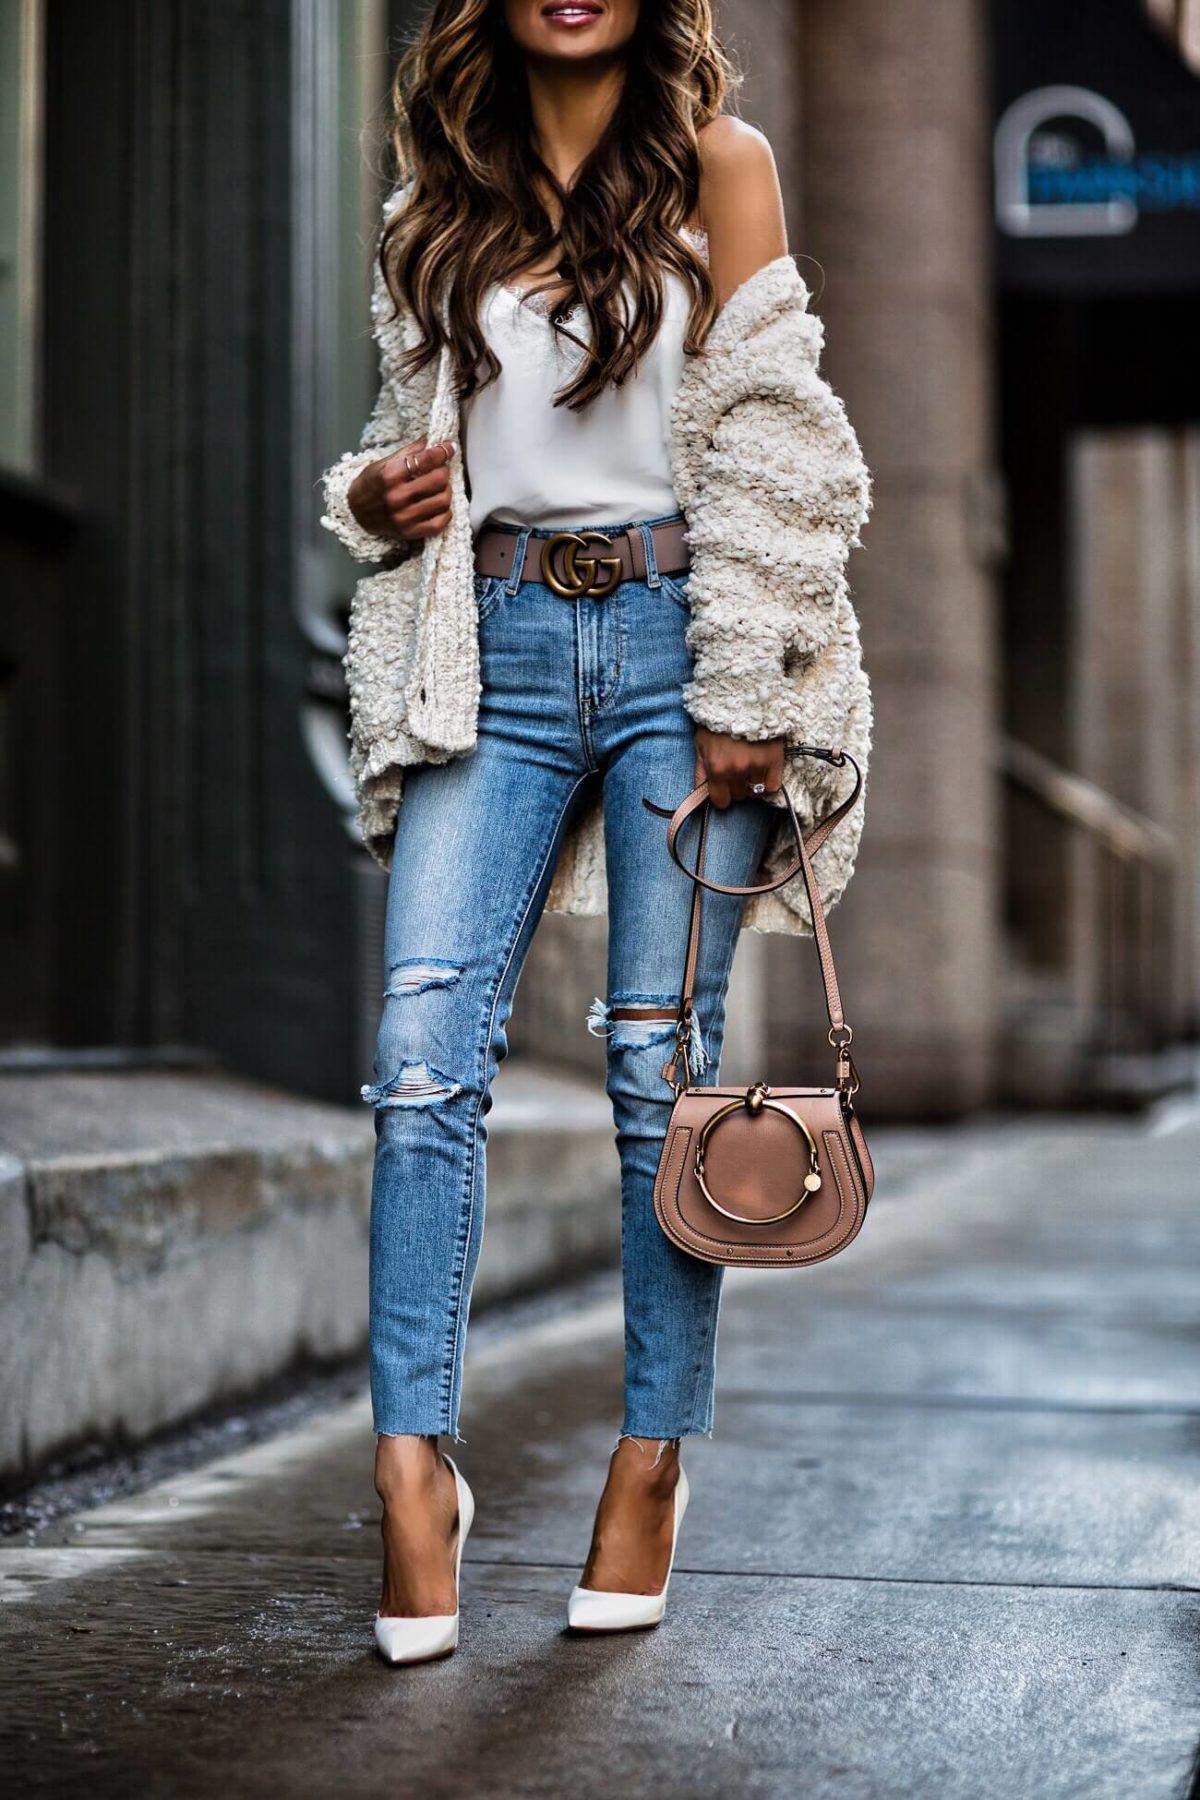 fashion blogger mia mia mine wearing a chloe nile bag and a gucci belt 661d3b59d96